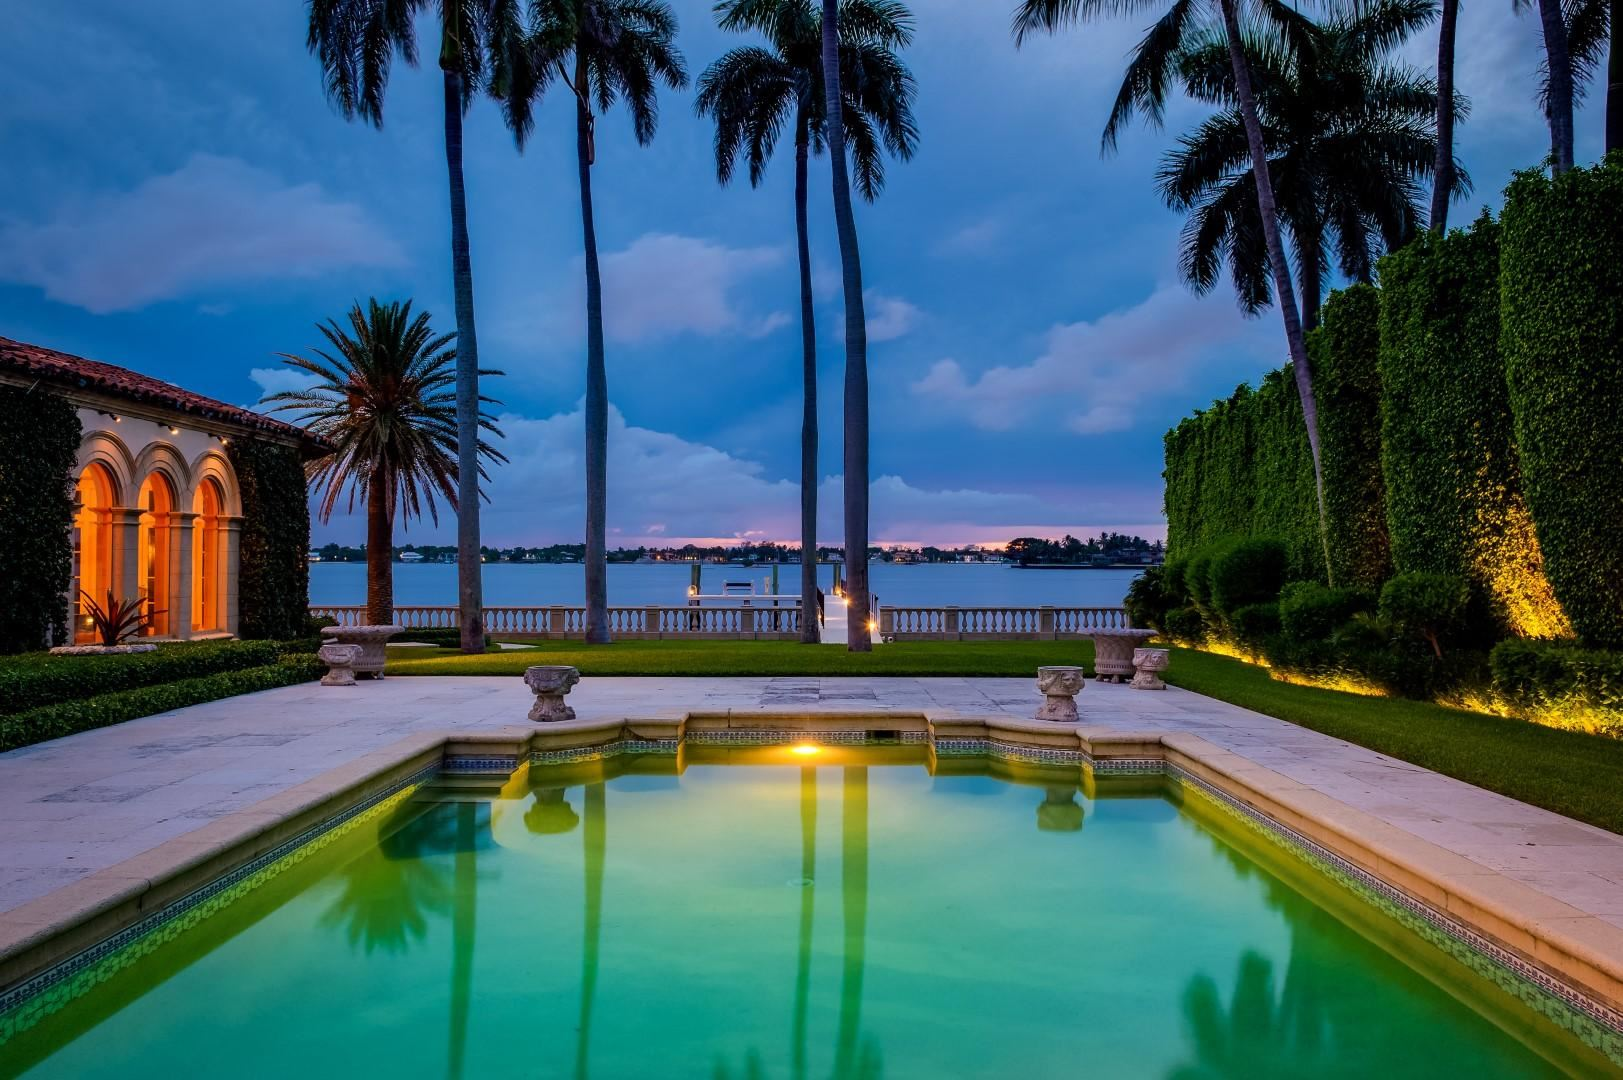 790 County, Palm Beach, 33480 Photo 1